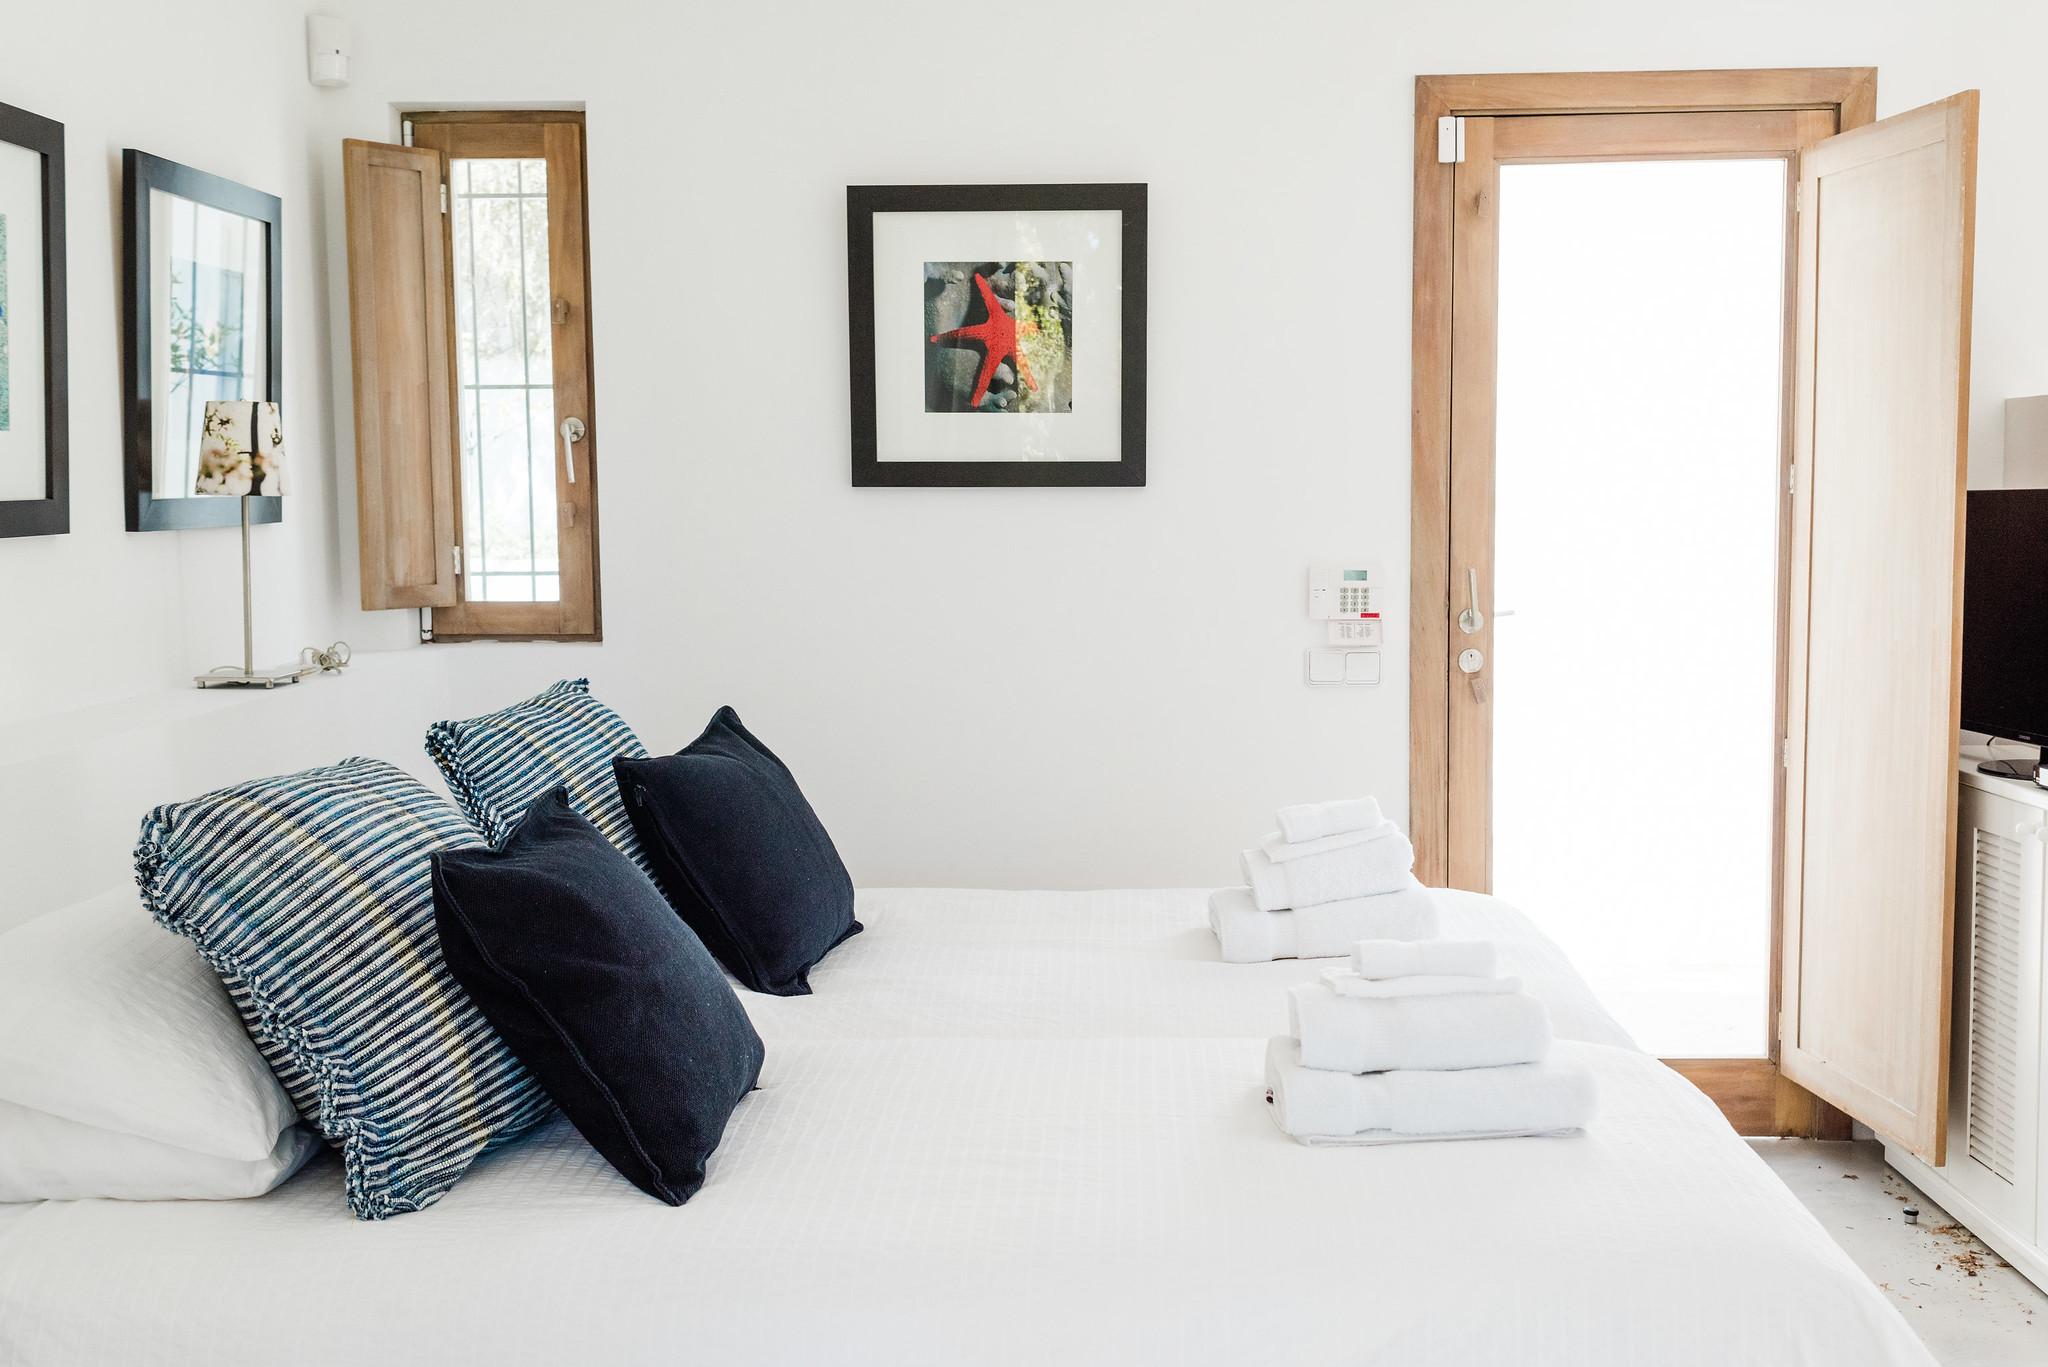 https://www.white-ibiza.com/wp-content/uploads/2020/06/white-ibiza-villas-casa-nyah-interior-bedroom2.jpg